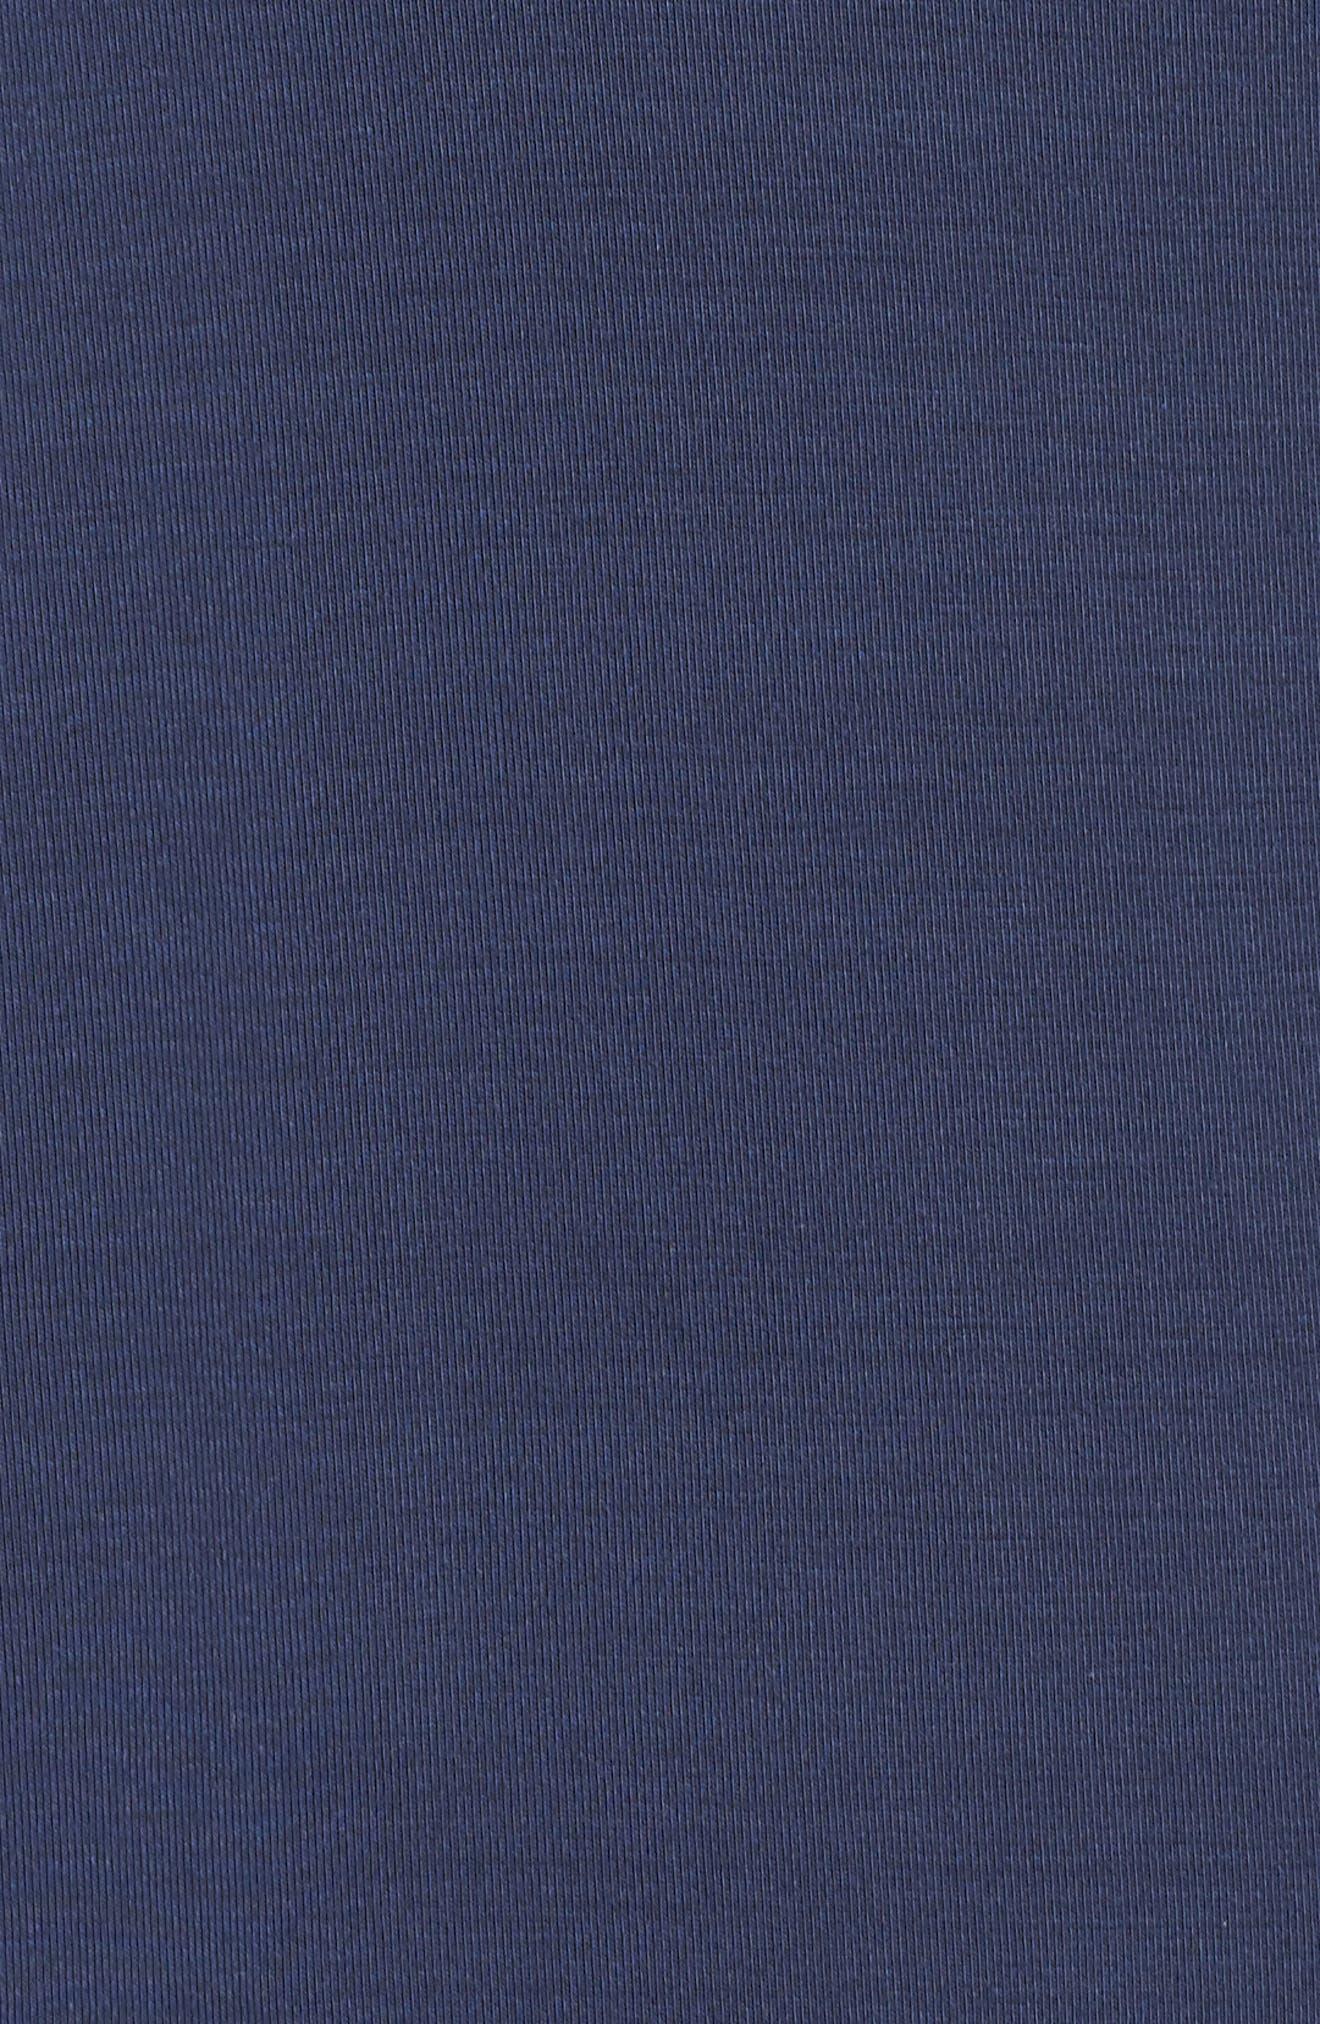 Flora Nikrooz Snuggle Camisole,                             Alternate thumbnail 5, color,                             STEEL BLUE